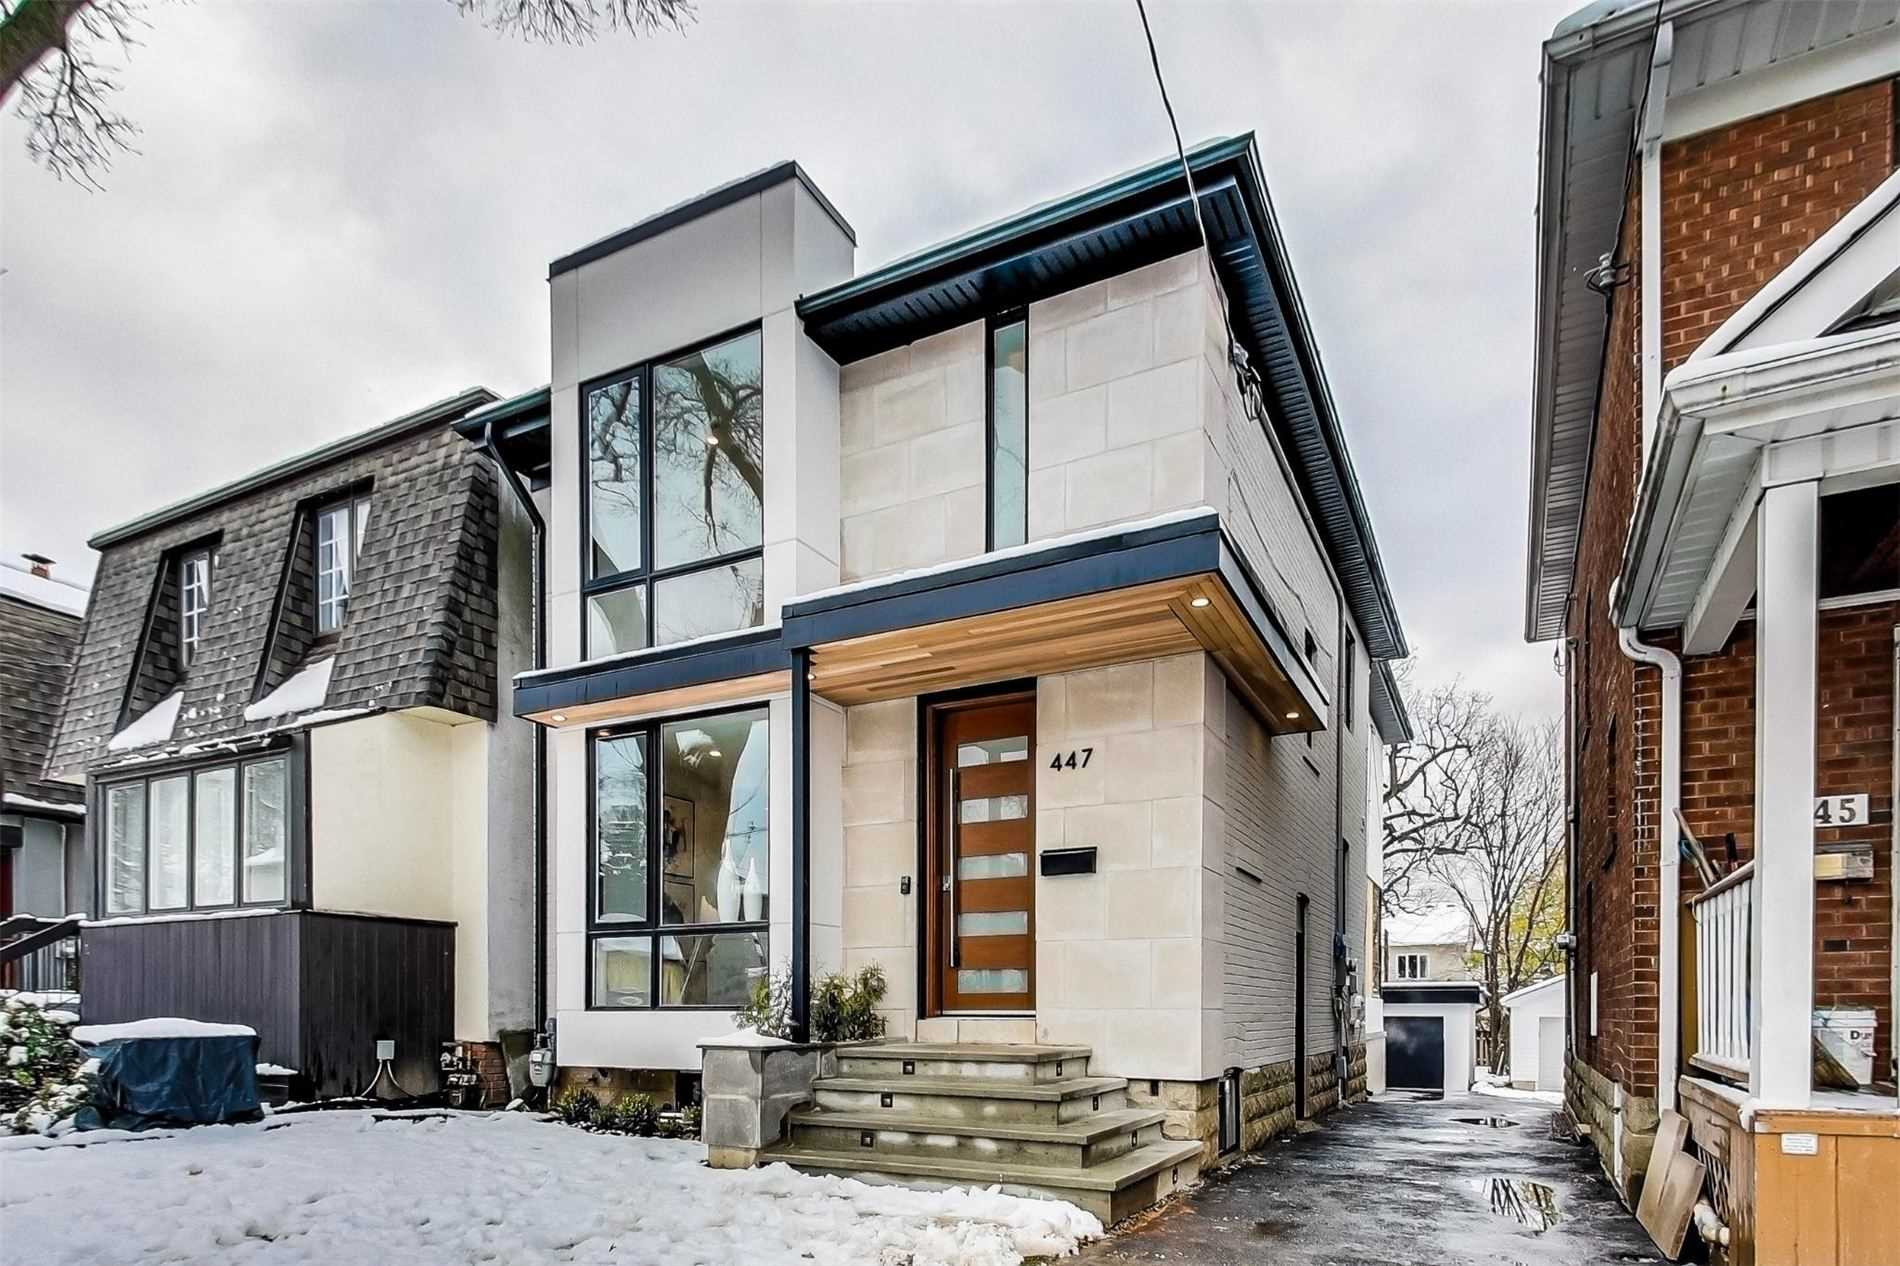 447 Soudan Ave, Toronto, Ontario M4S1X1, 4 Bedrooms Bedrooms, 12 Rooms Rooms,5 BathroomsBathrooms,Detached,For Sale,Soudan,C5076999